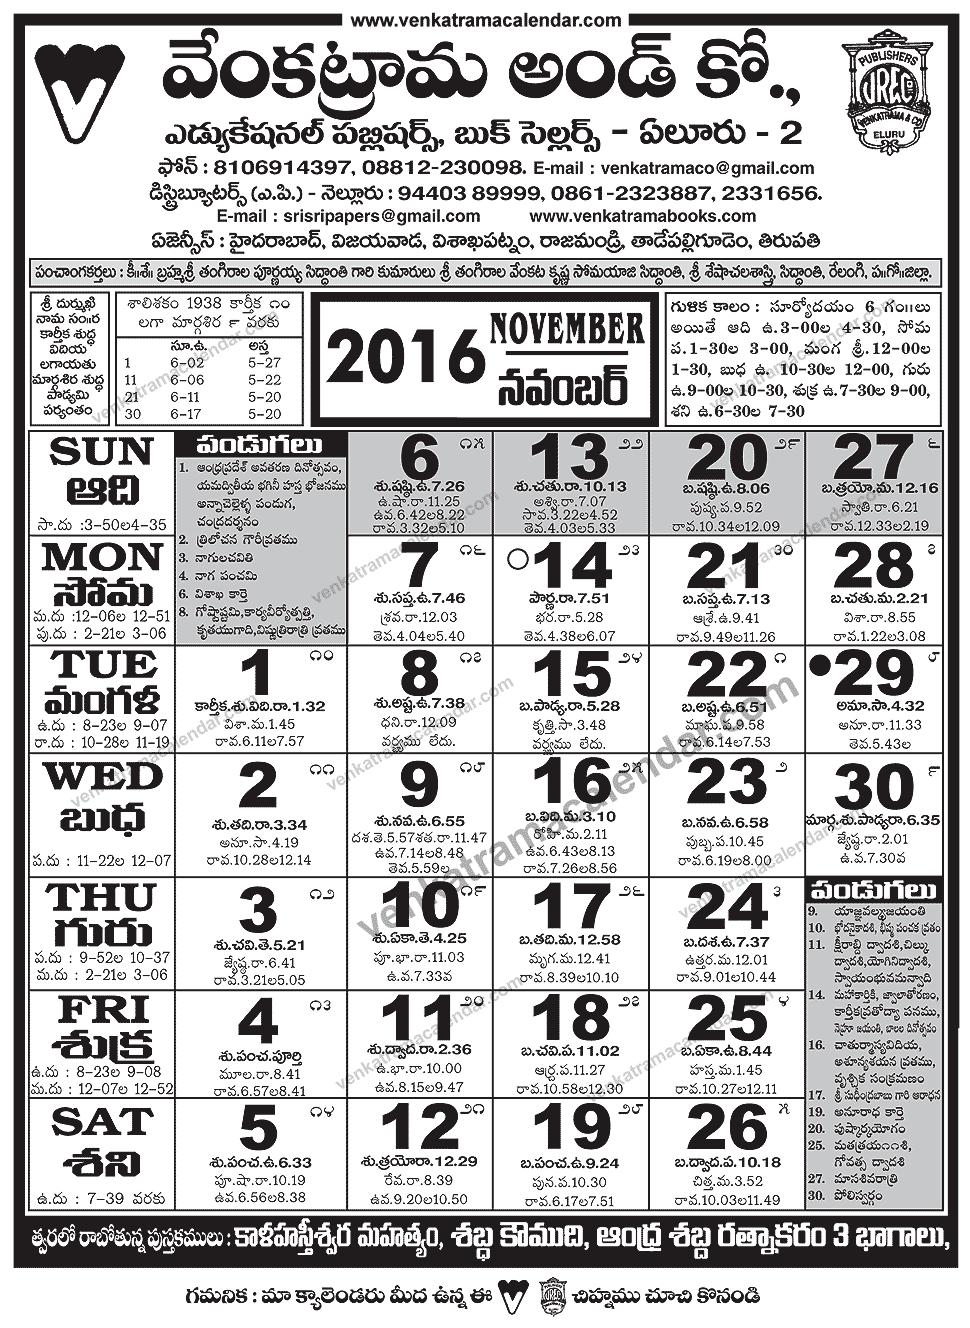 New York Telugu Calendar 2022.Venkatrama Co 2016 November Telugu Calendar Festivals Holidays